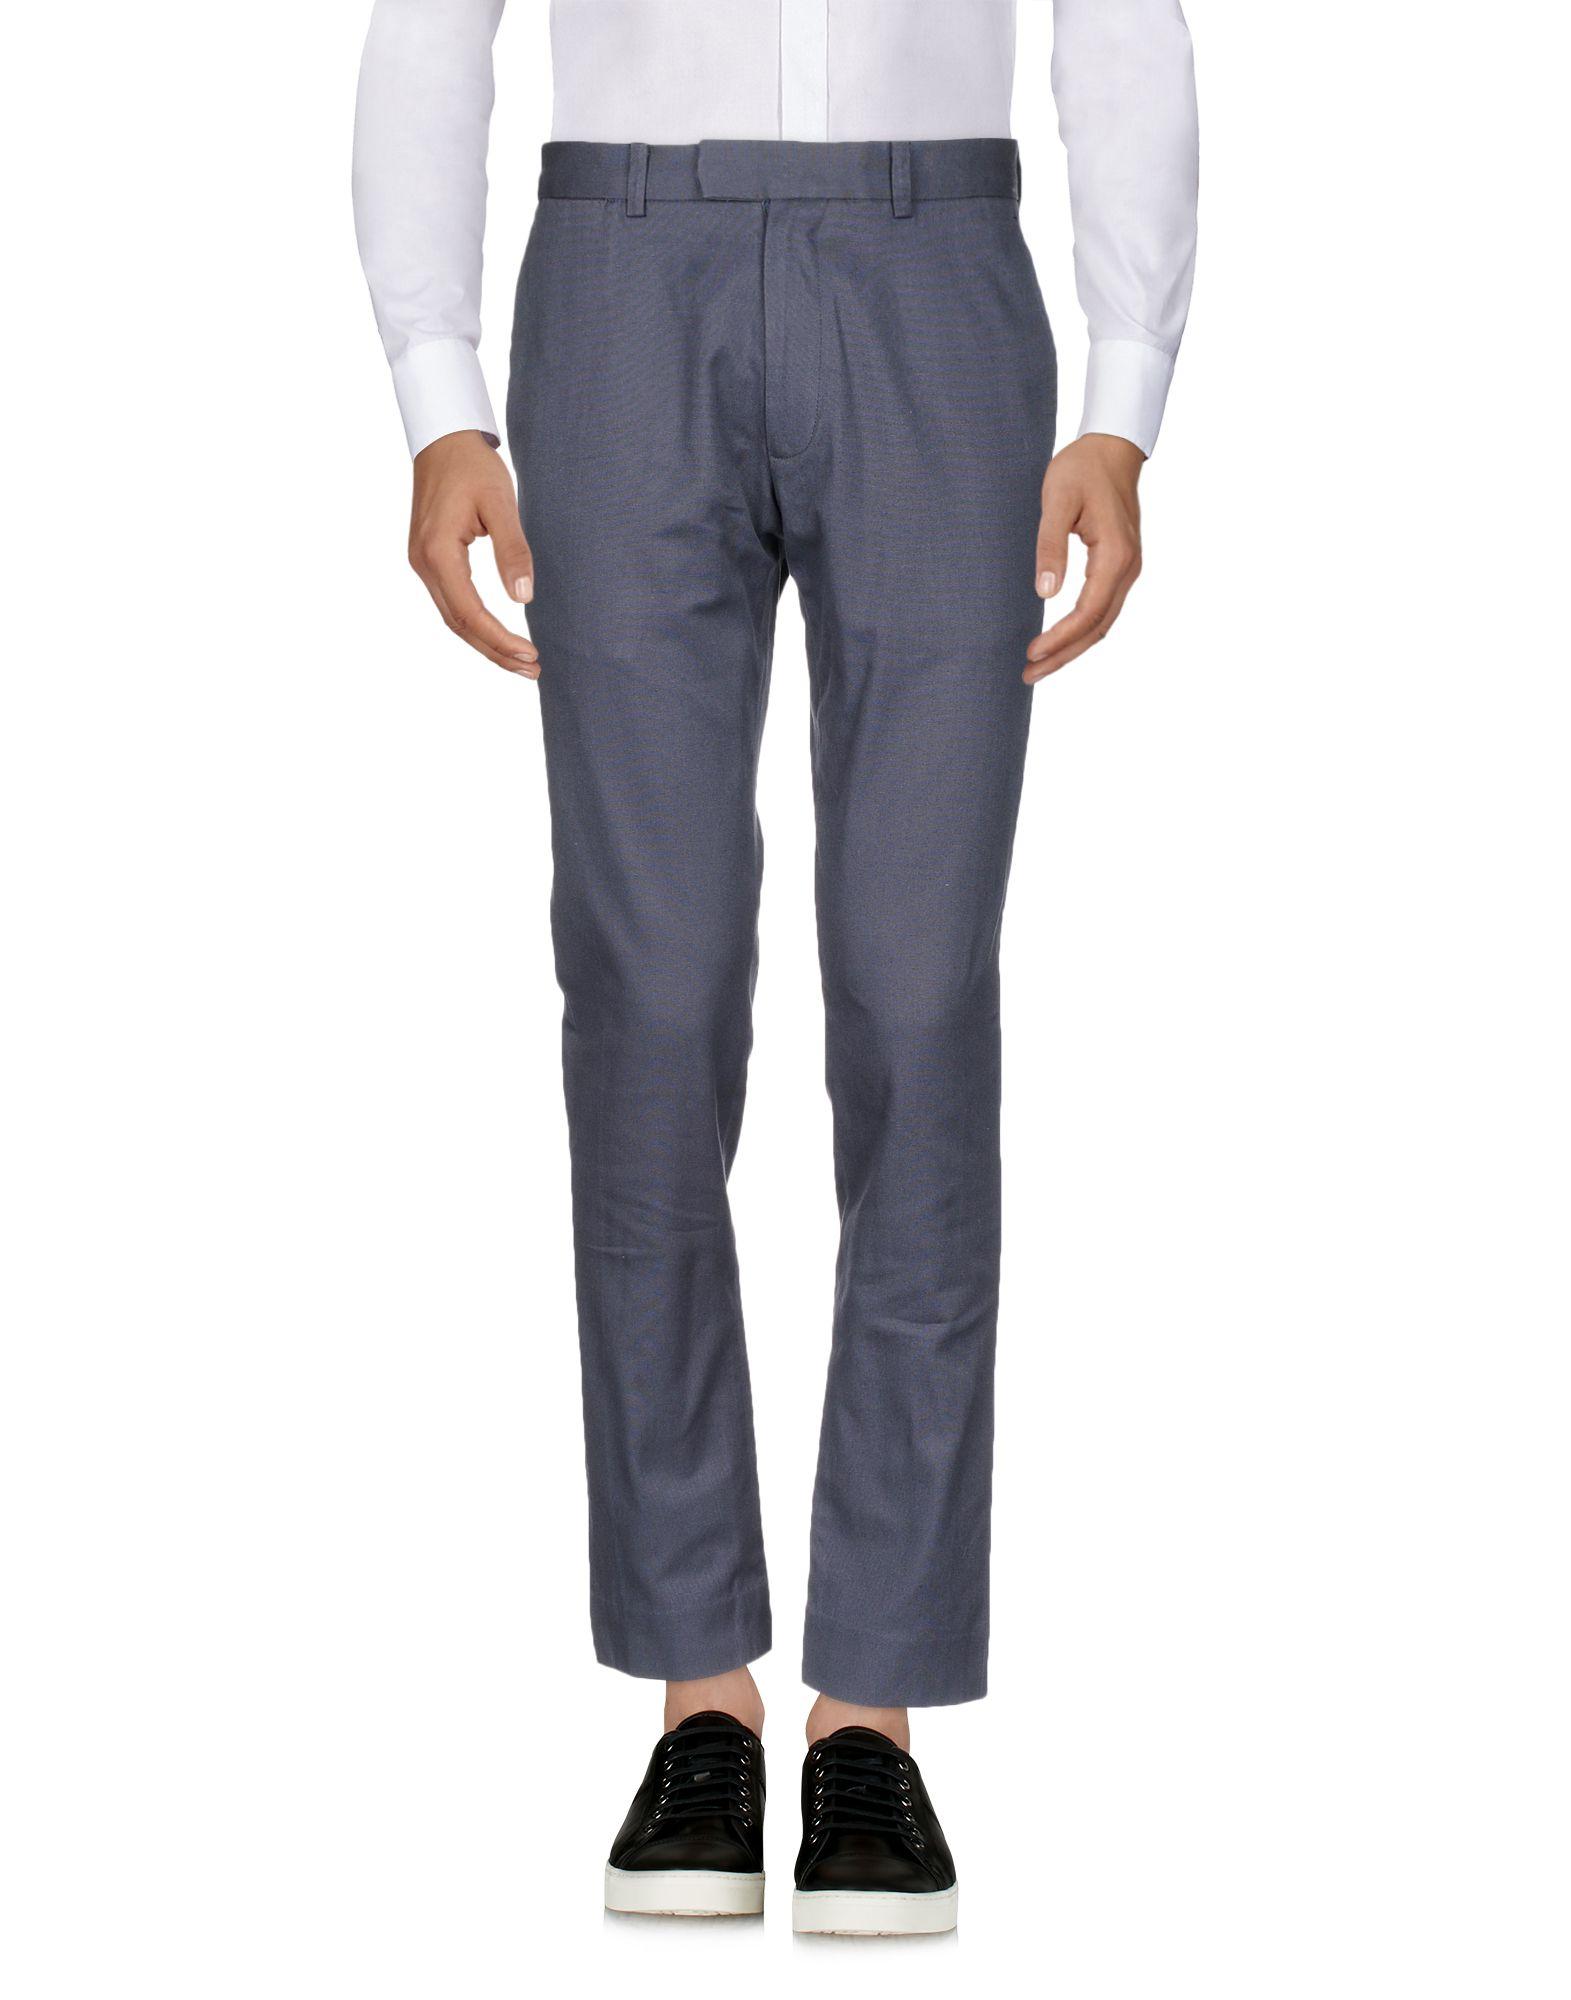 ENLIST Casual Pants in Slate Blue